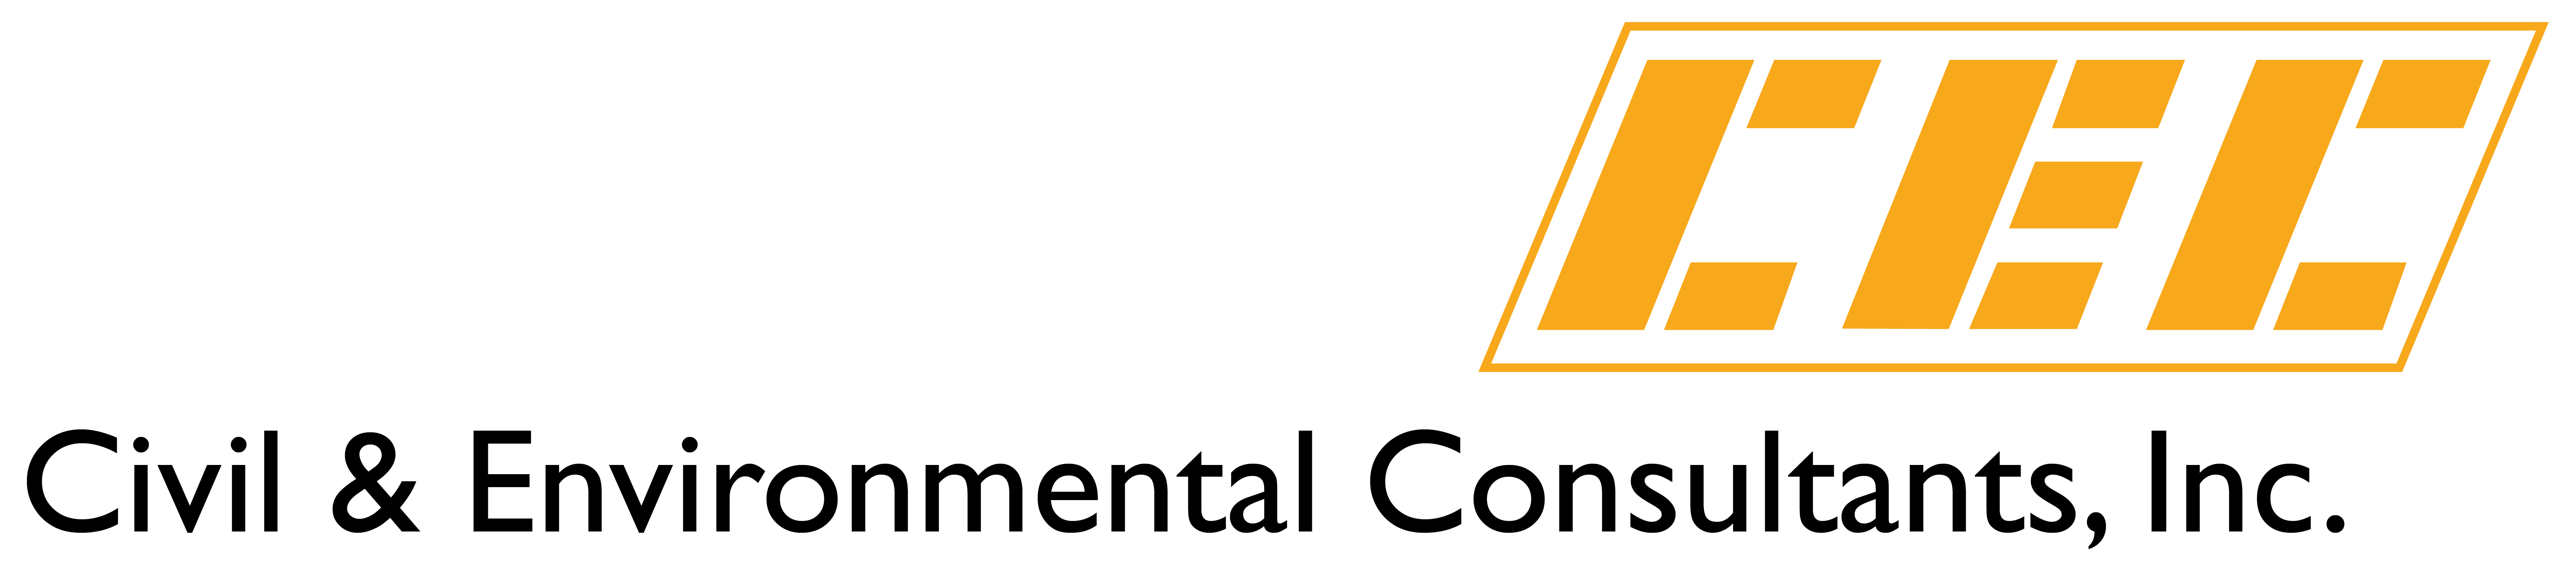 Civil & Environmental Consultants, Inc. logo